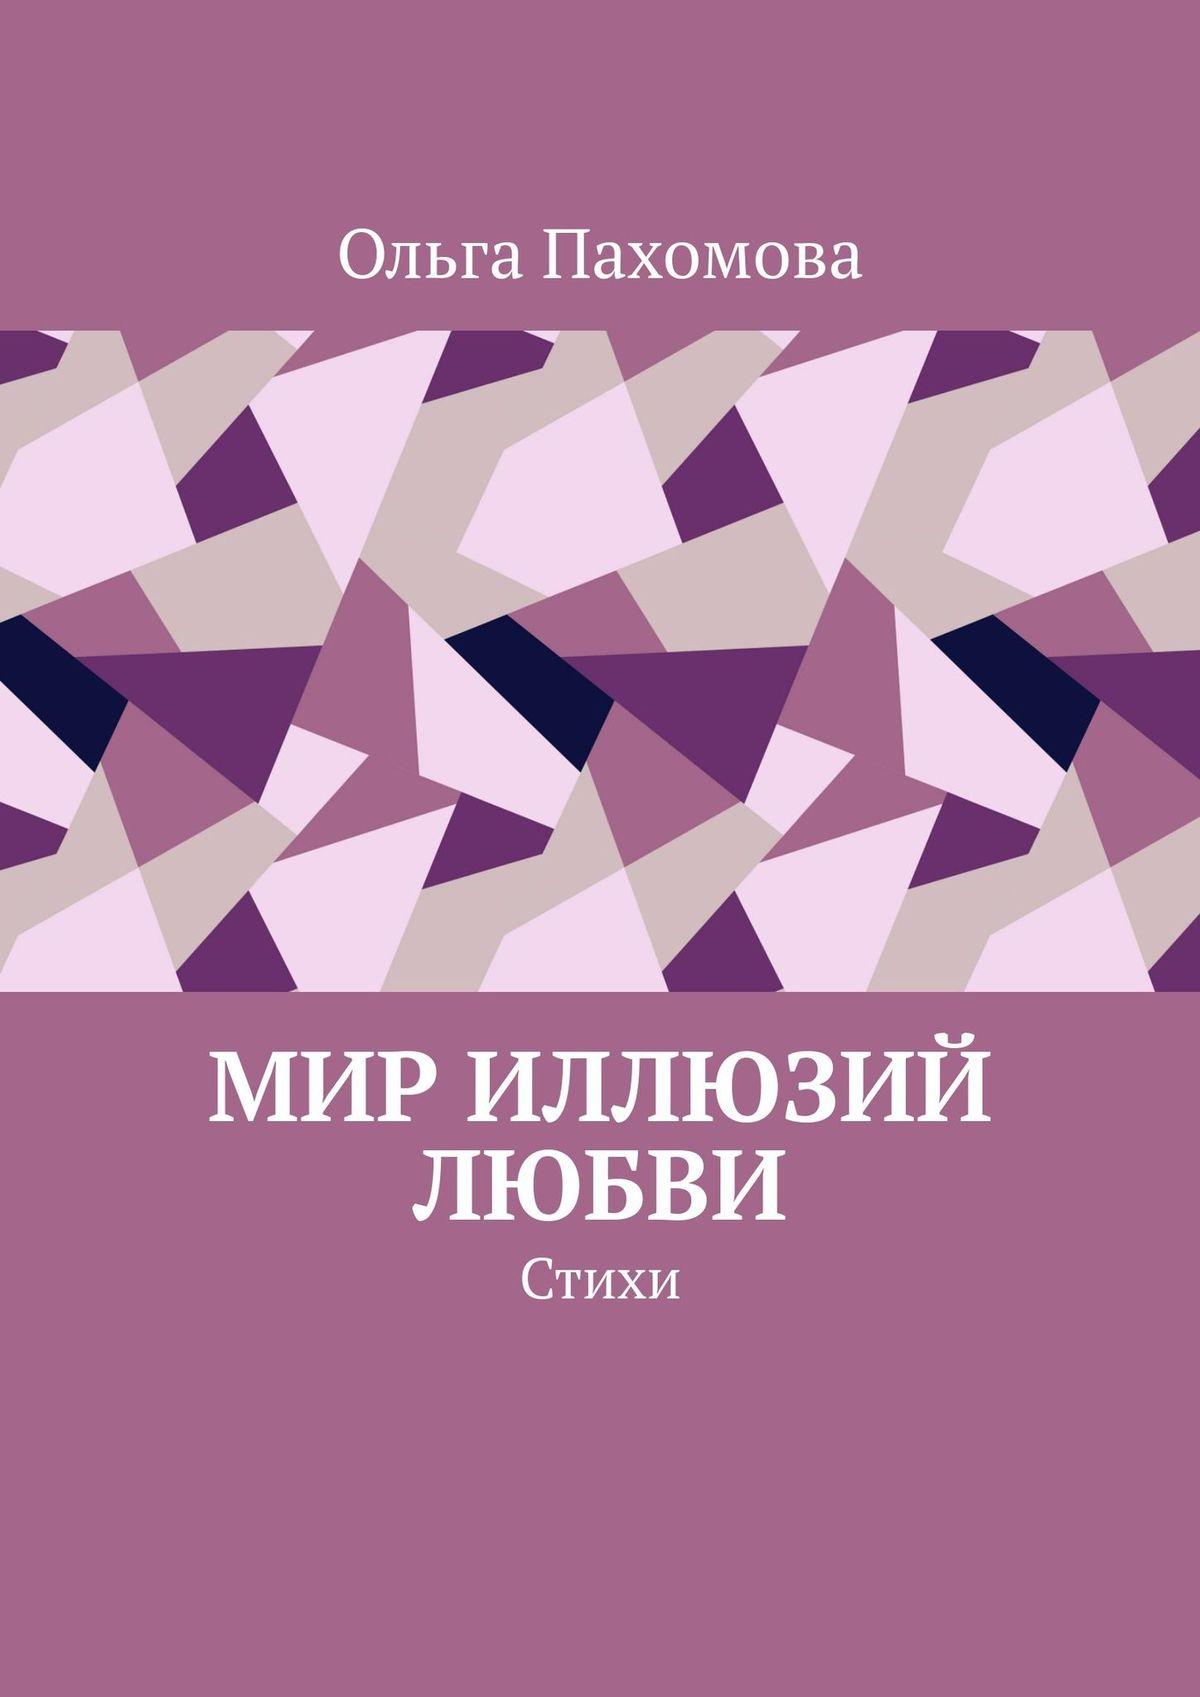 Ольга Пахомова Мир иллюзий любви. Стихи